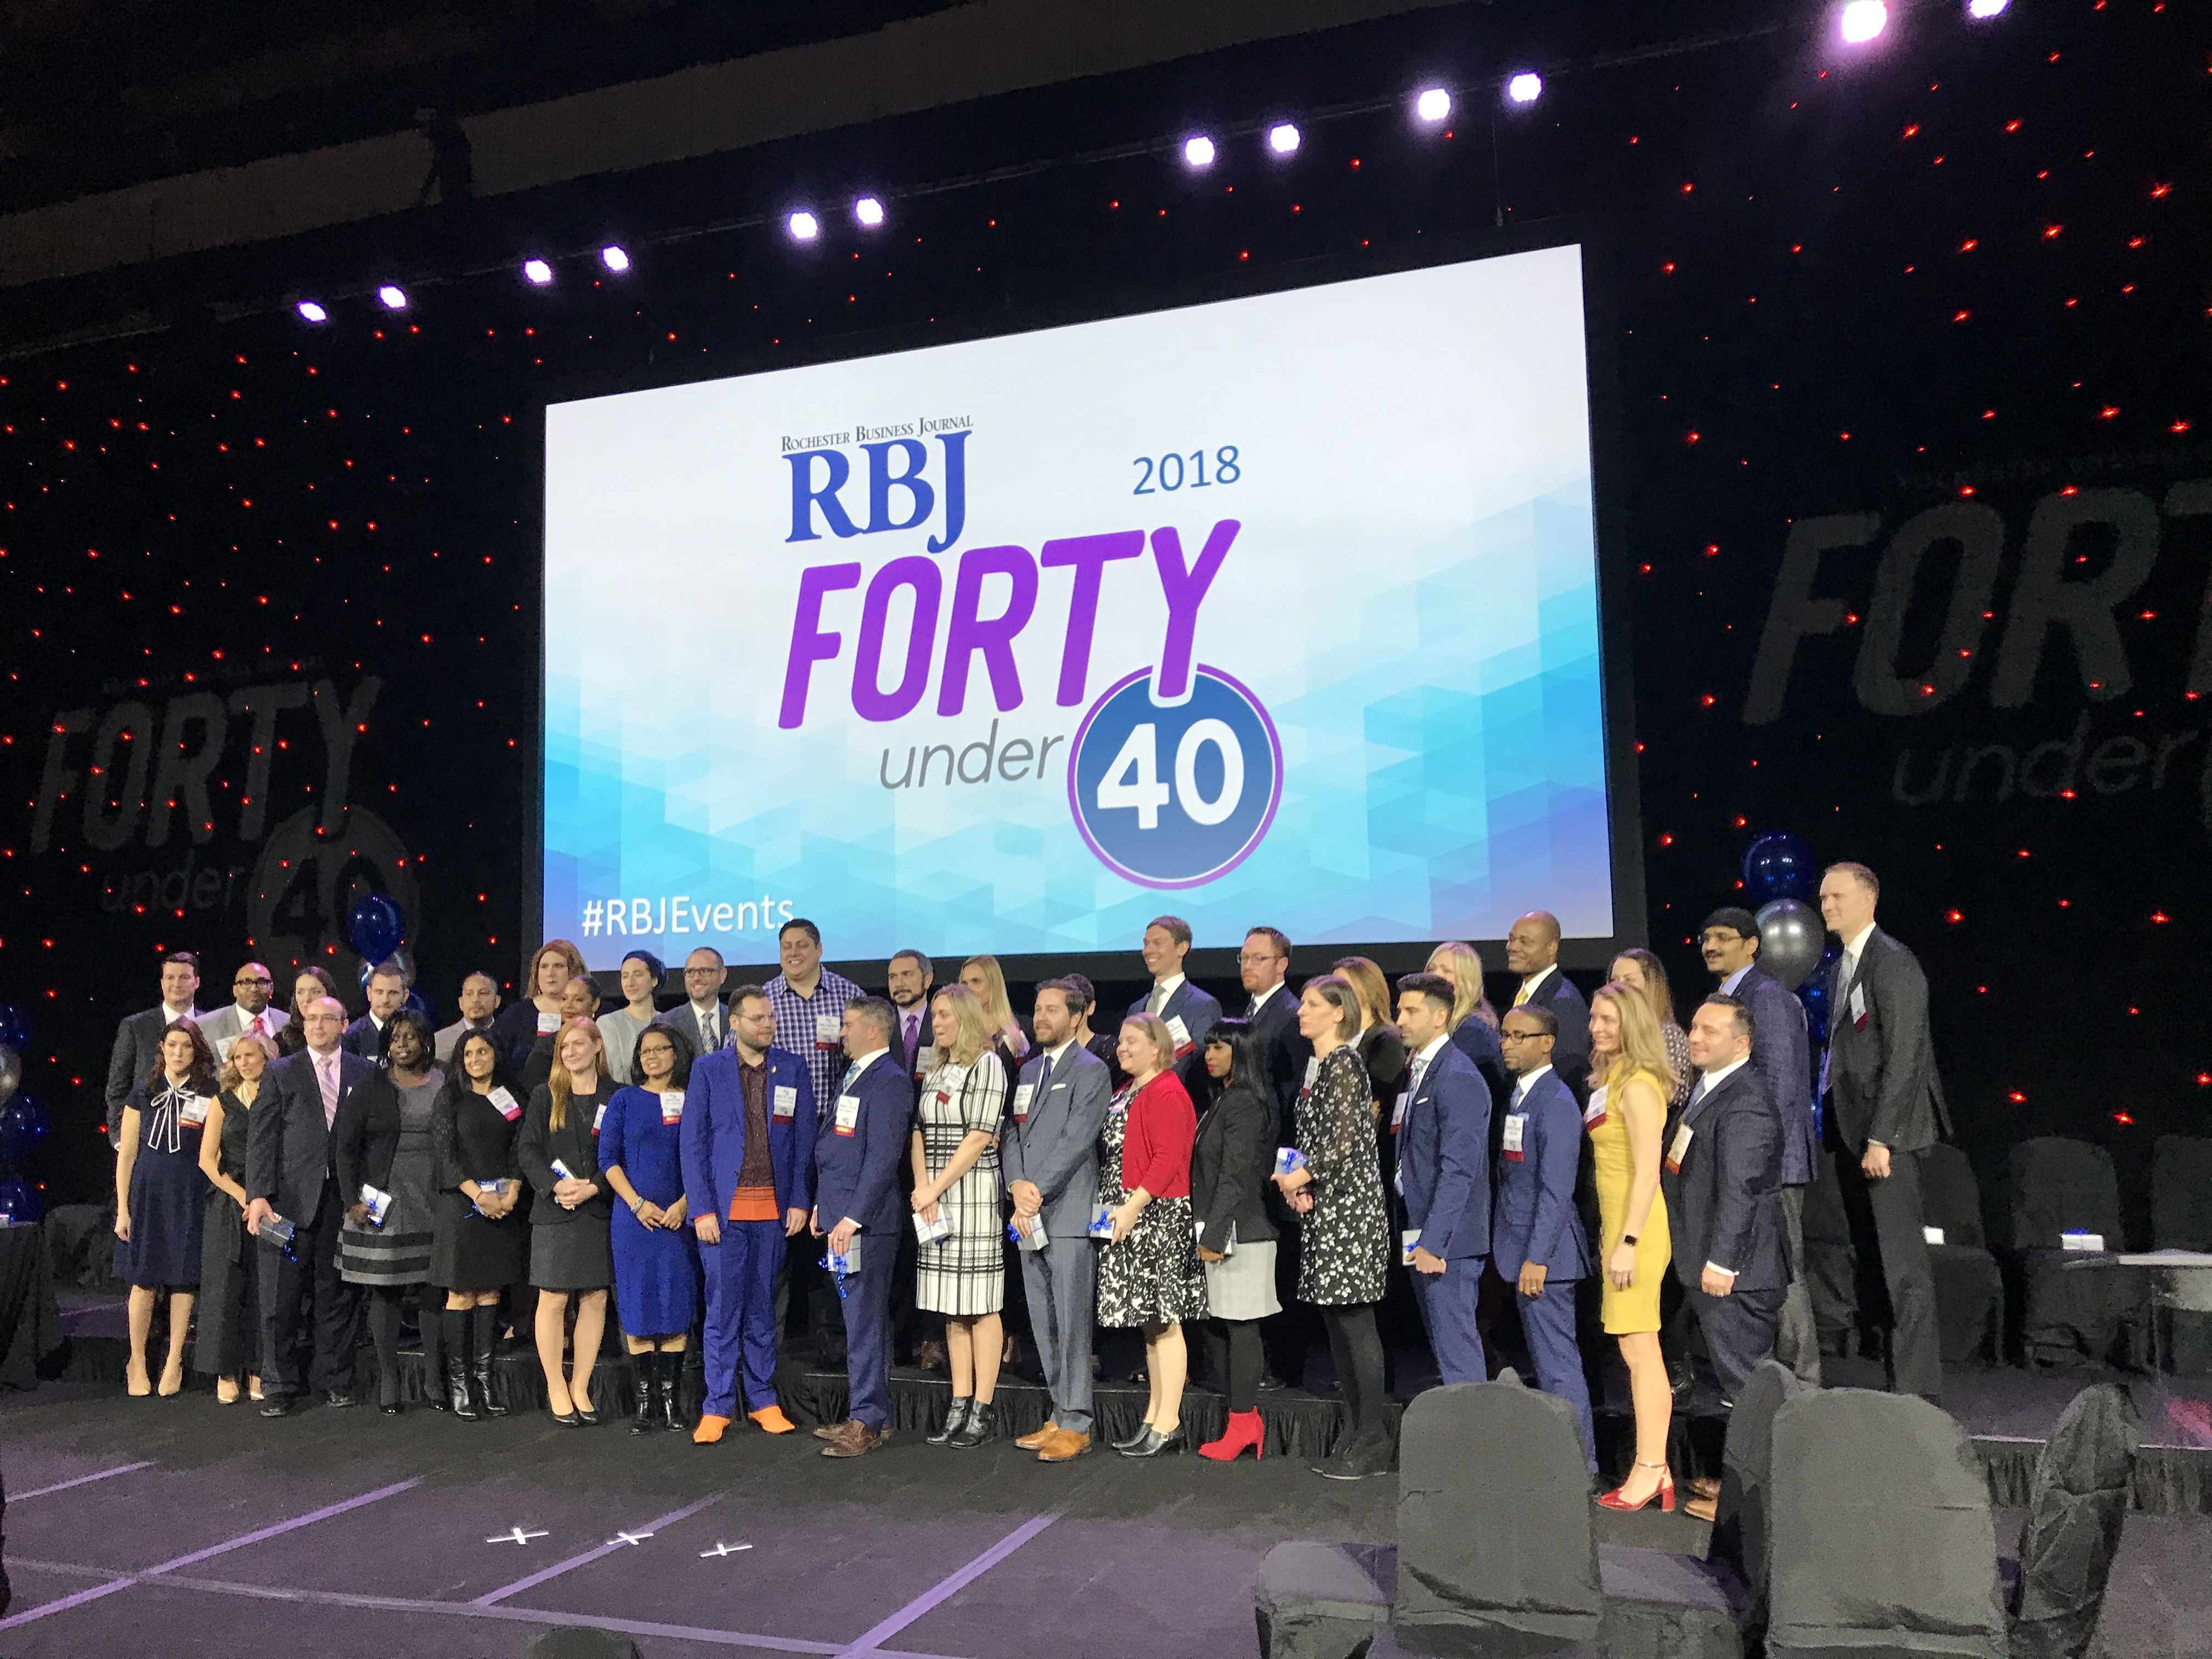 RBJ Forty Under 40 Award Ceremony